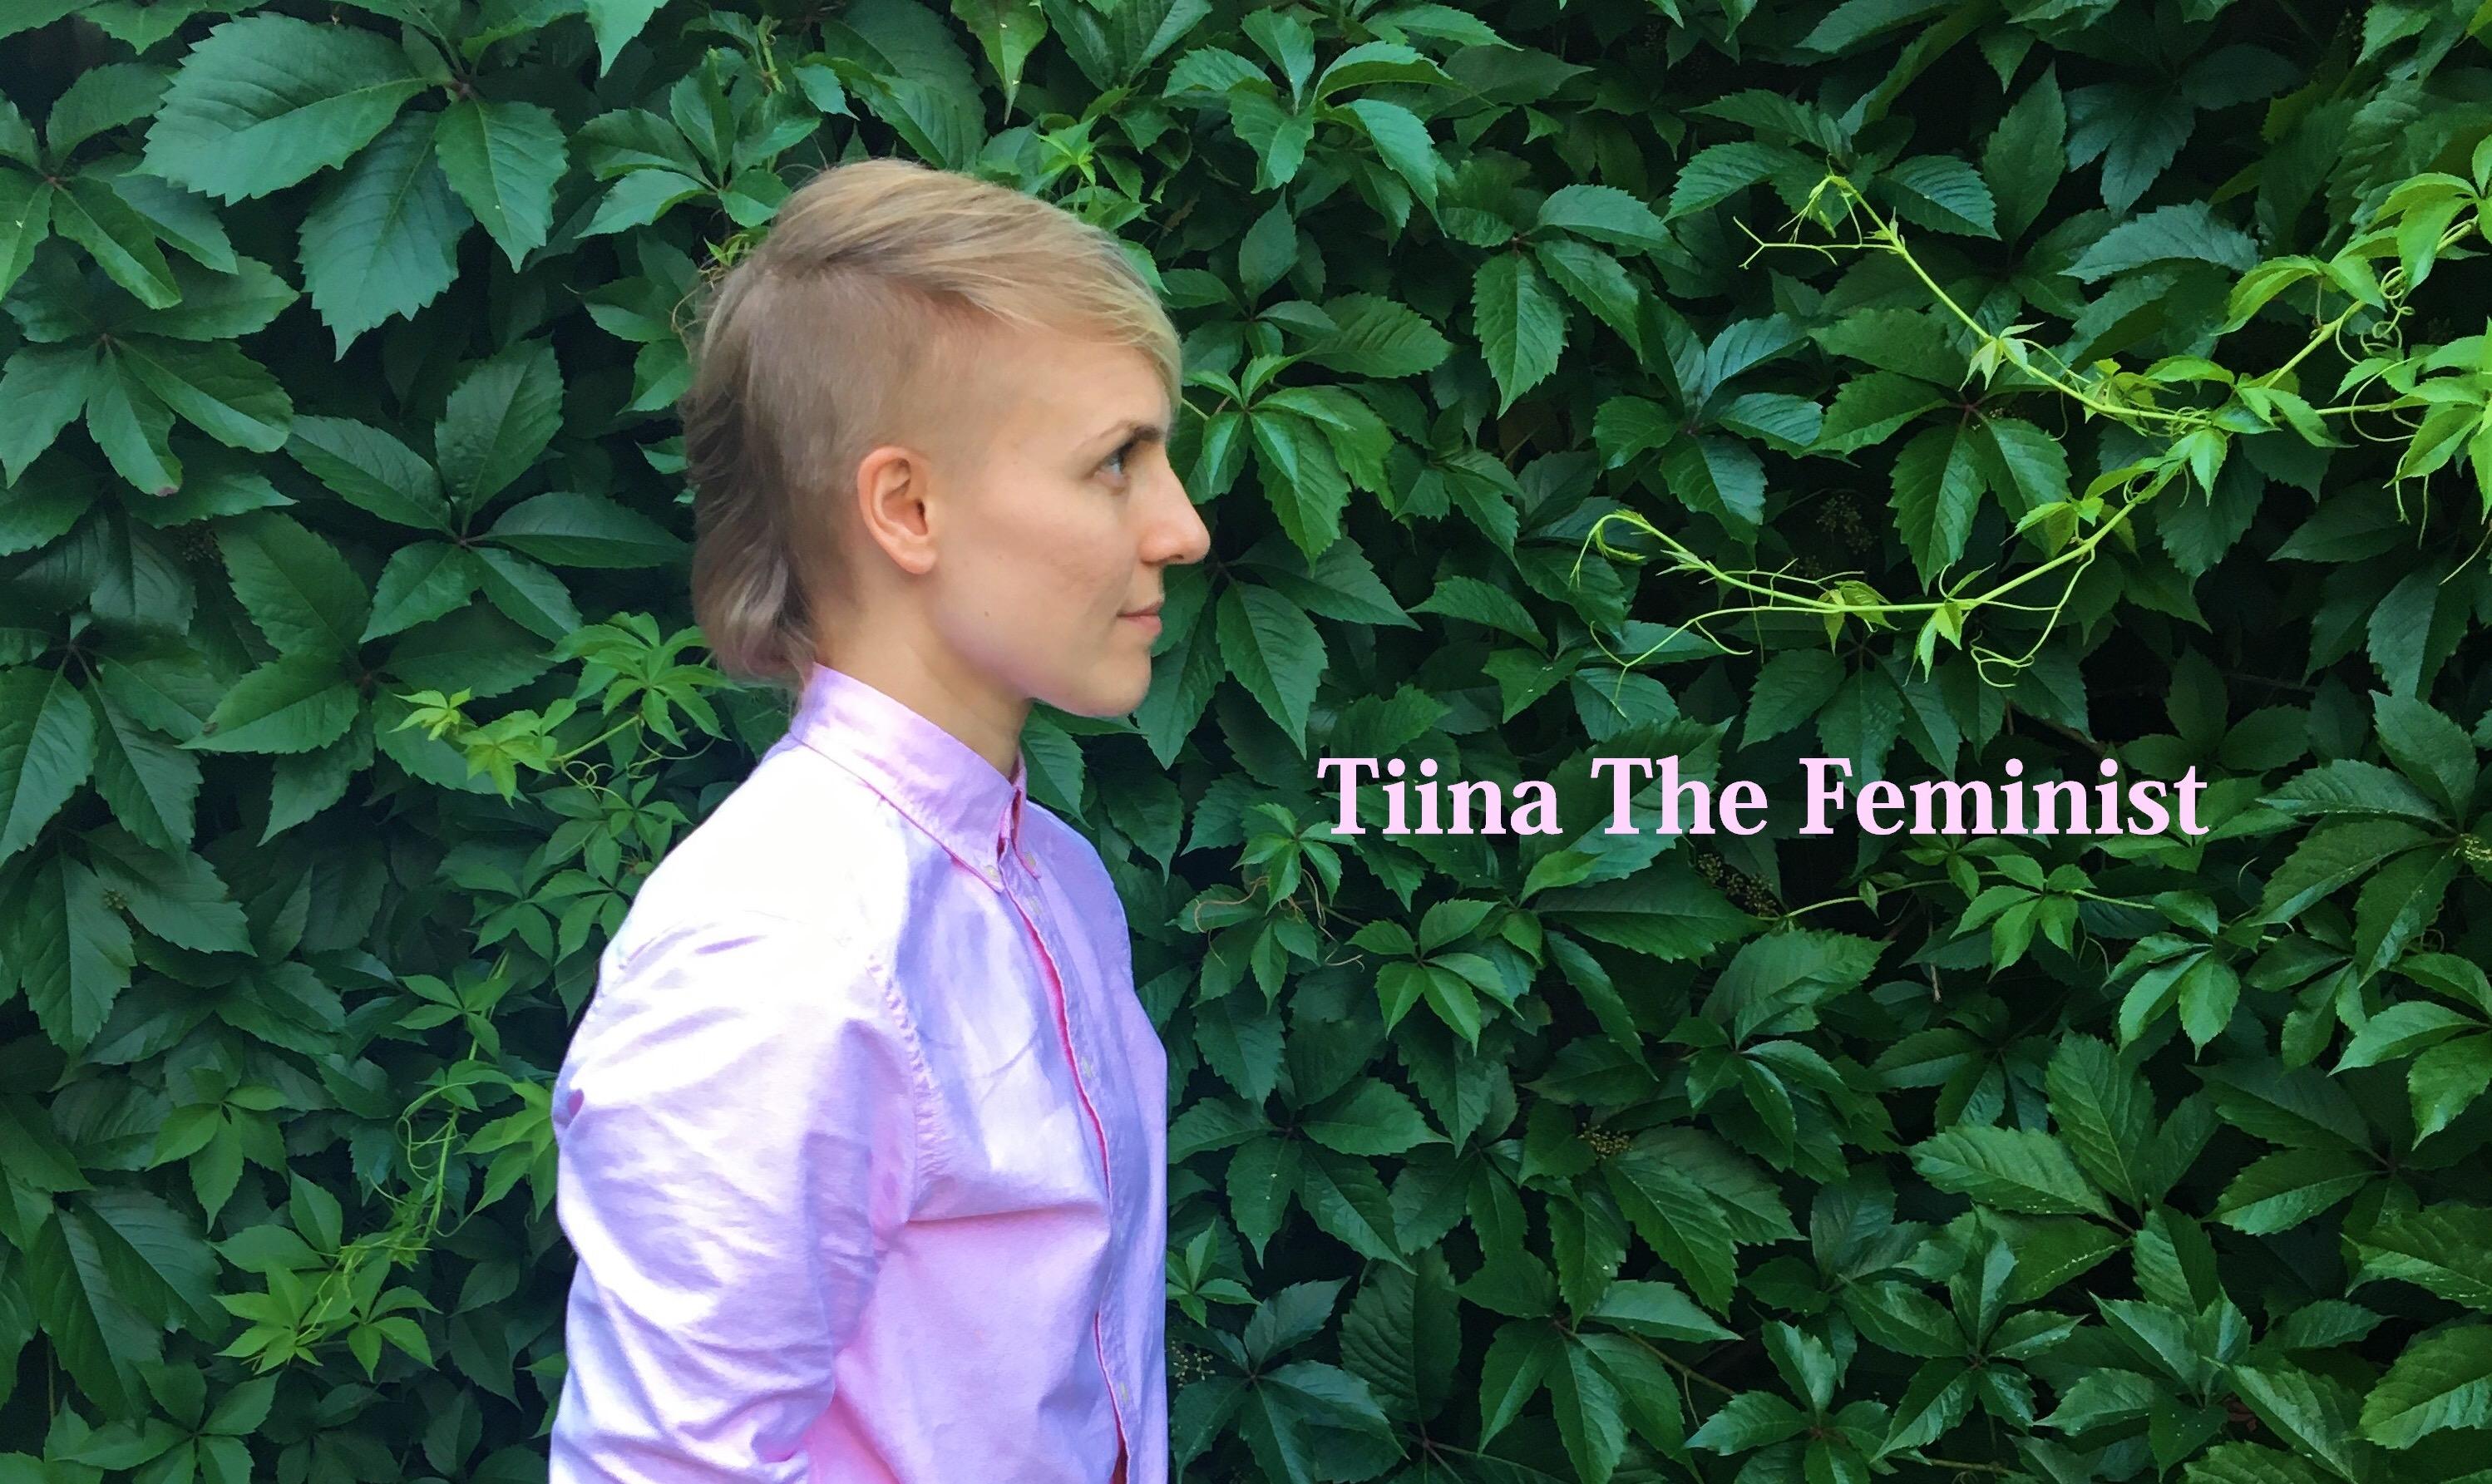 Tiina The Feminist